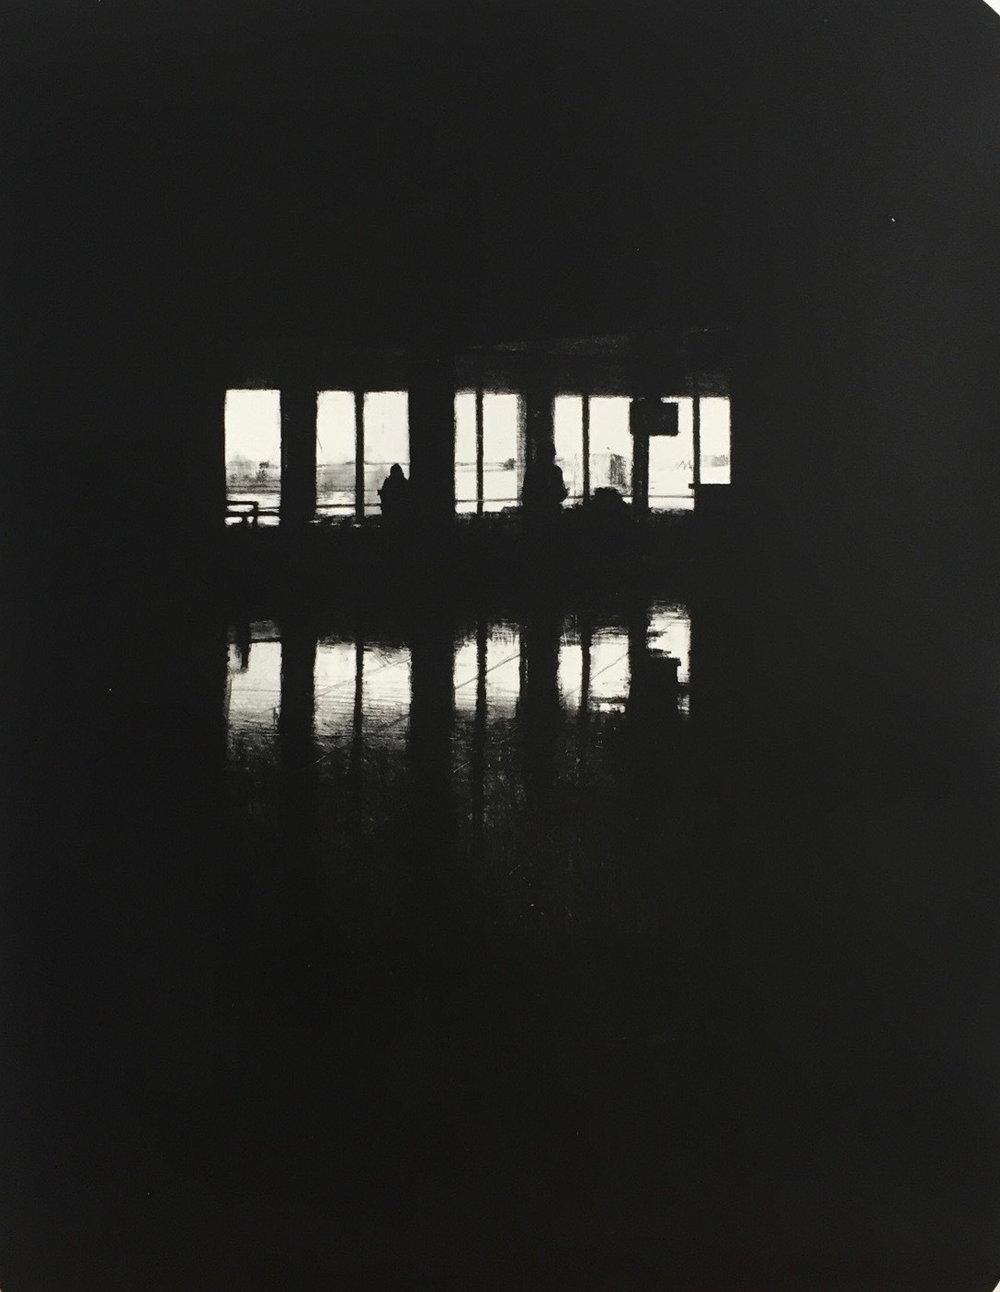 Departures II (JFK), 2016, lithograph, 55cm x 75cm, Ed. 12